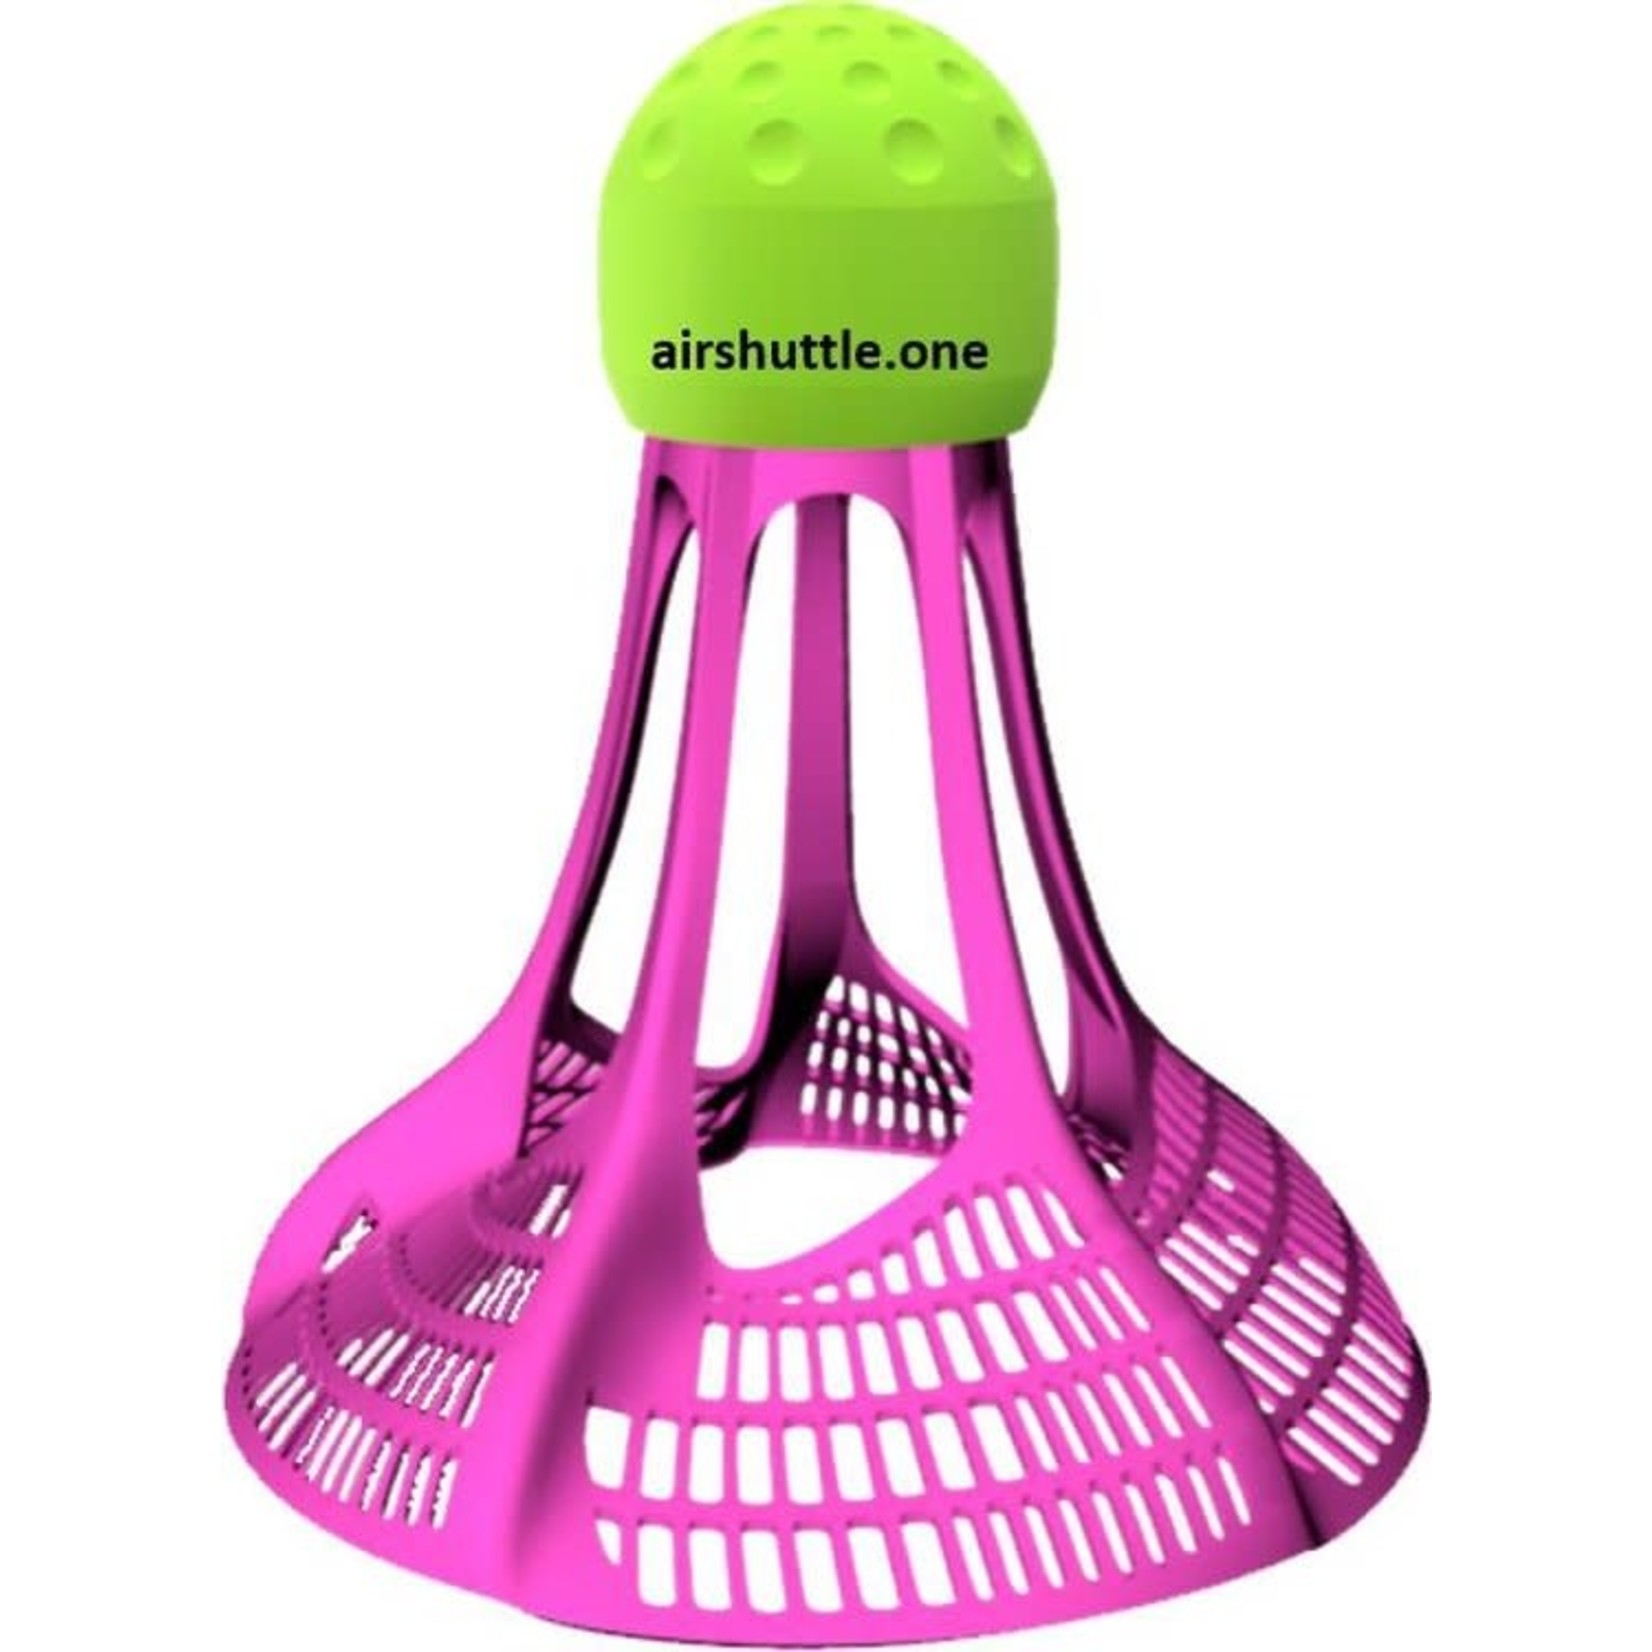 Air shuttle One Air shuttle One Outdoor badmintonshuttle (3PCS)